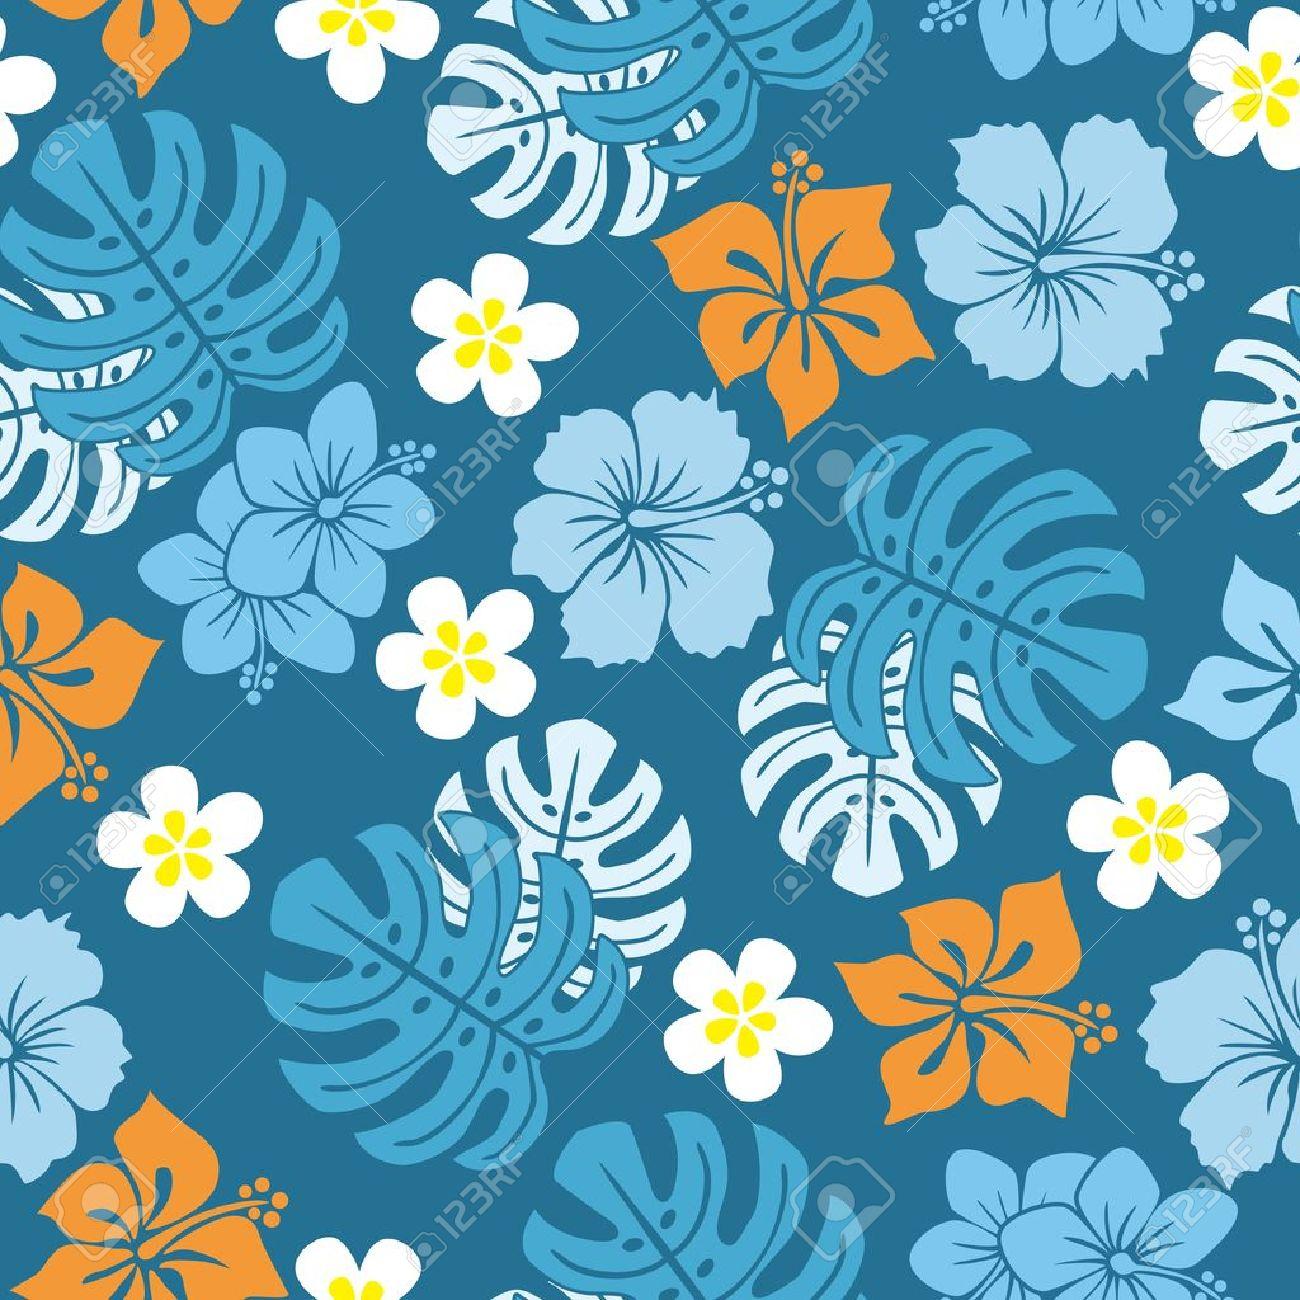 Keiki Hawaiian Humpty  Blue background with white